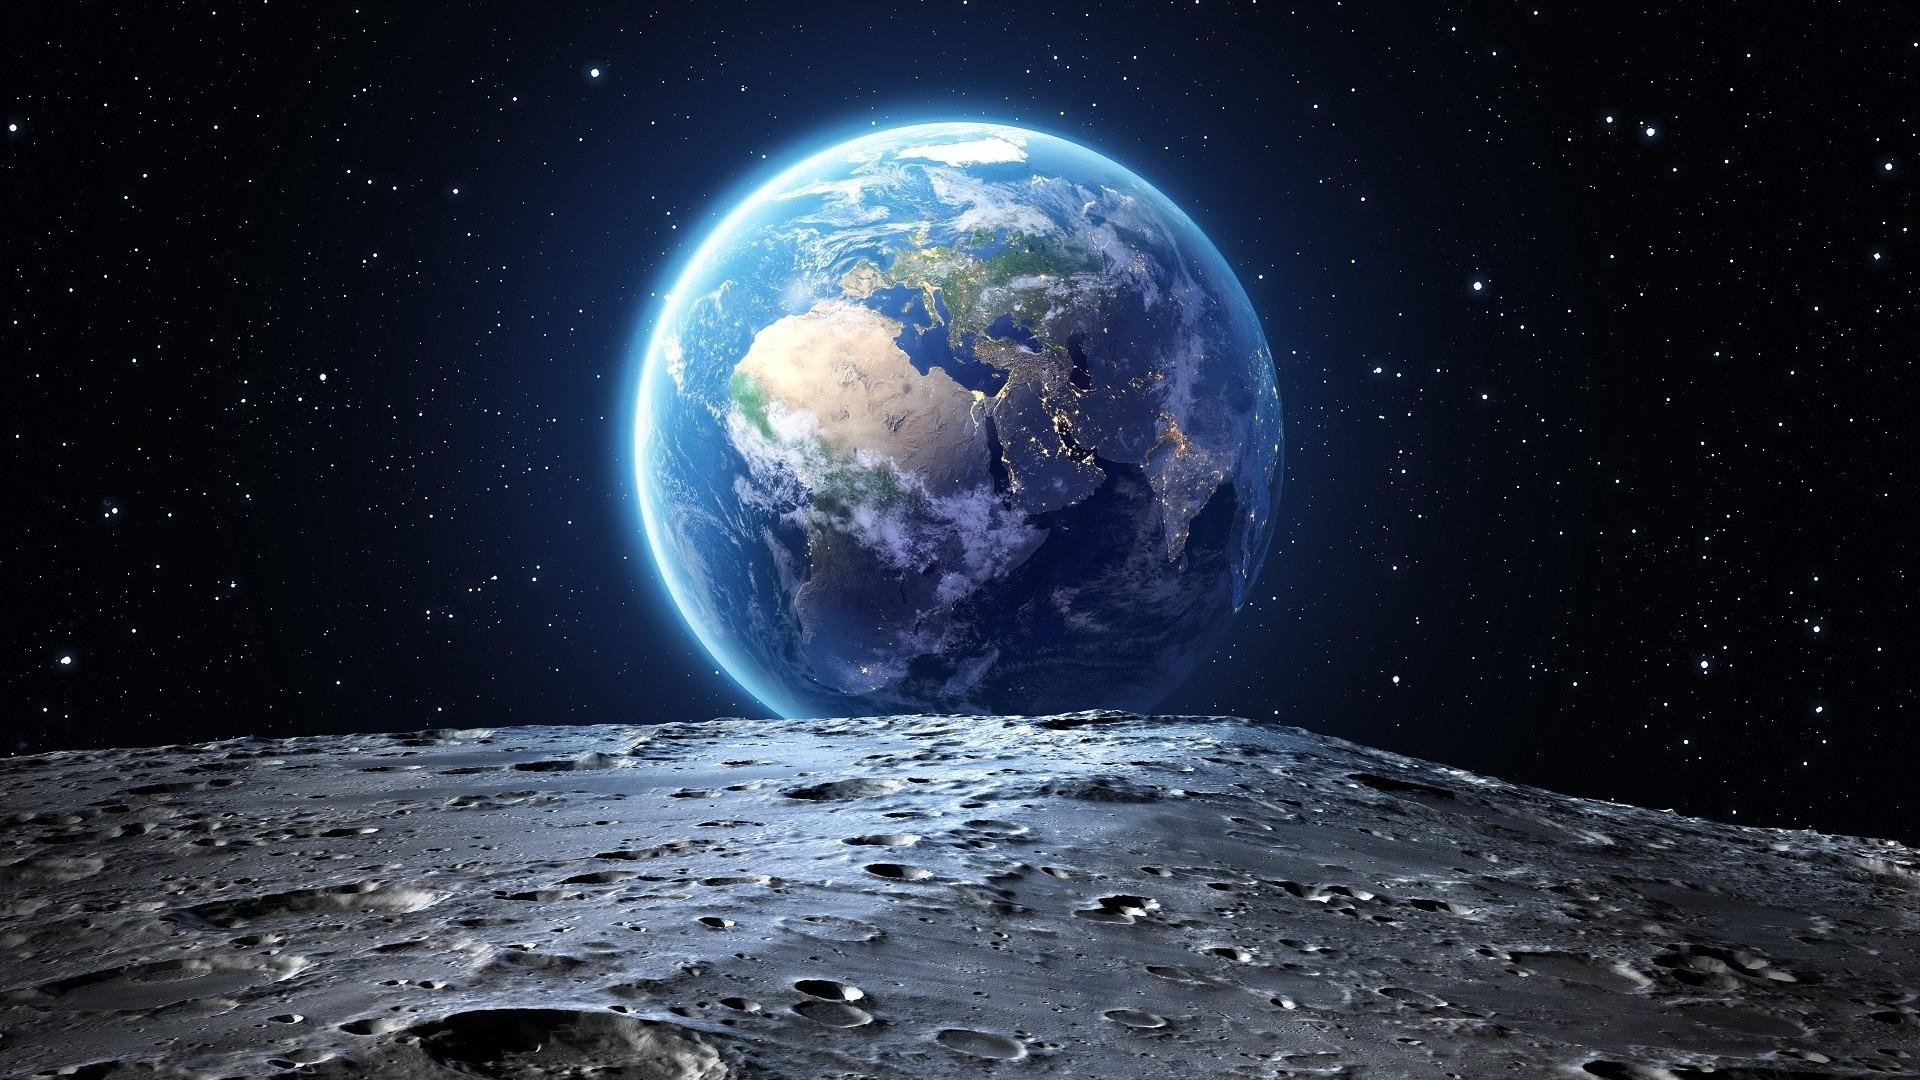 Earth Planet Space Hd Theme Wallpaper Preview 10wallpaper Com